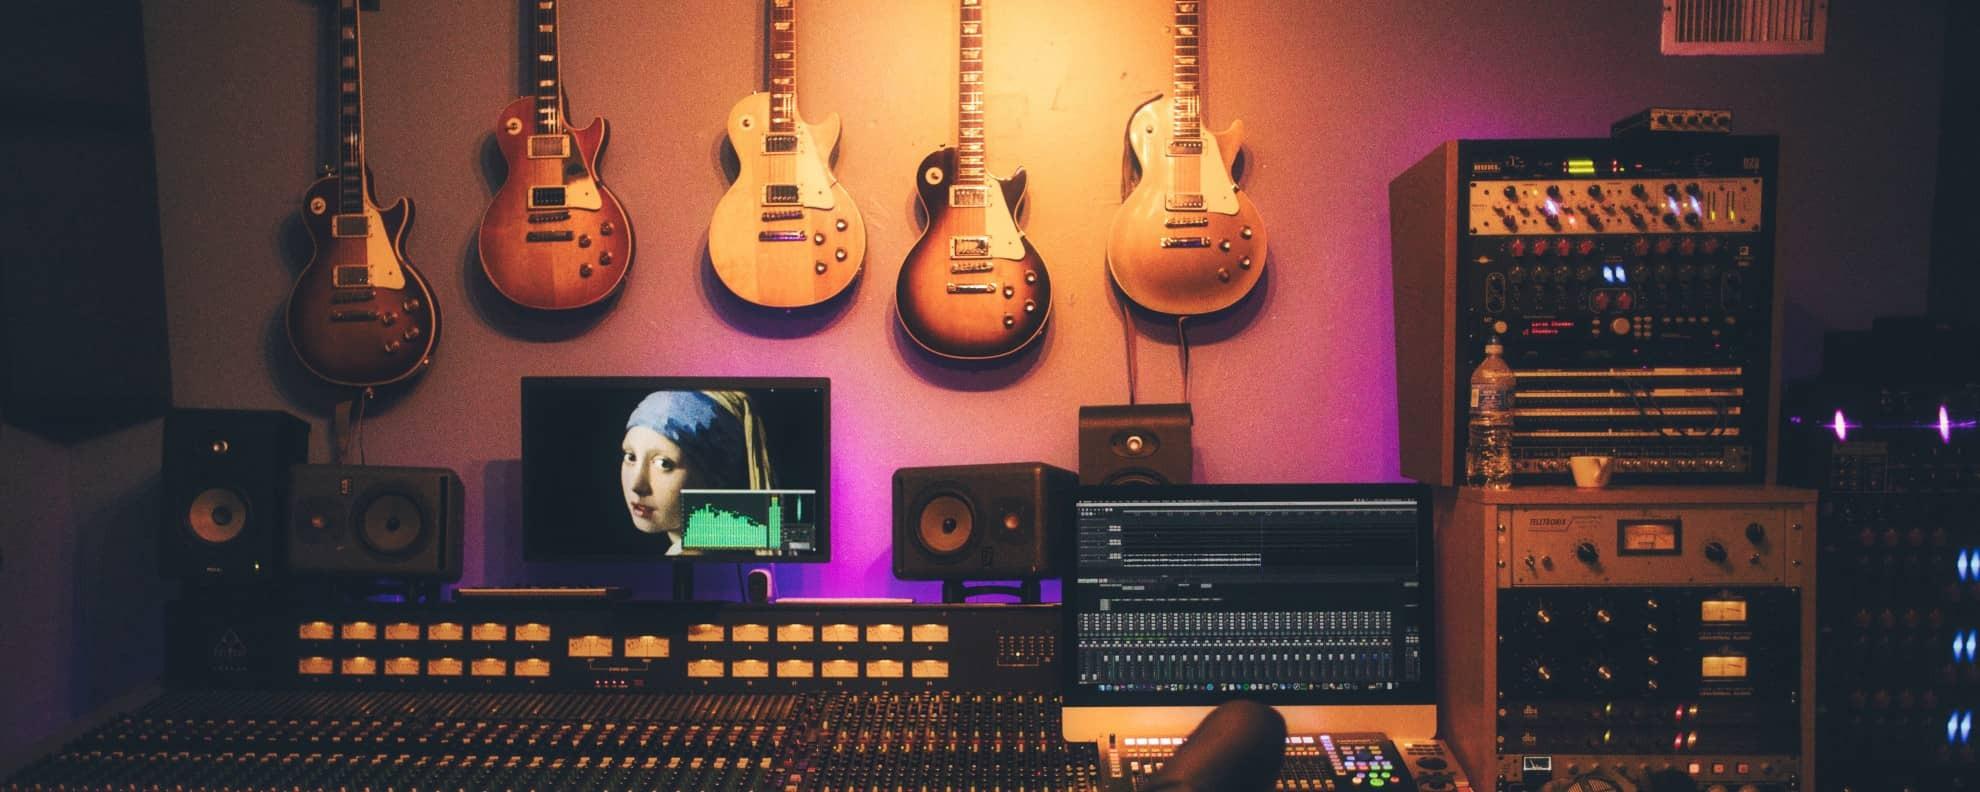 Musikproduktion Studium: Dein Weg ins Musikbusiness